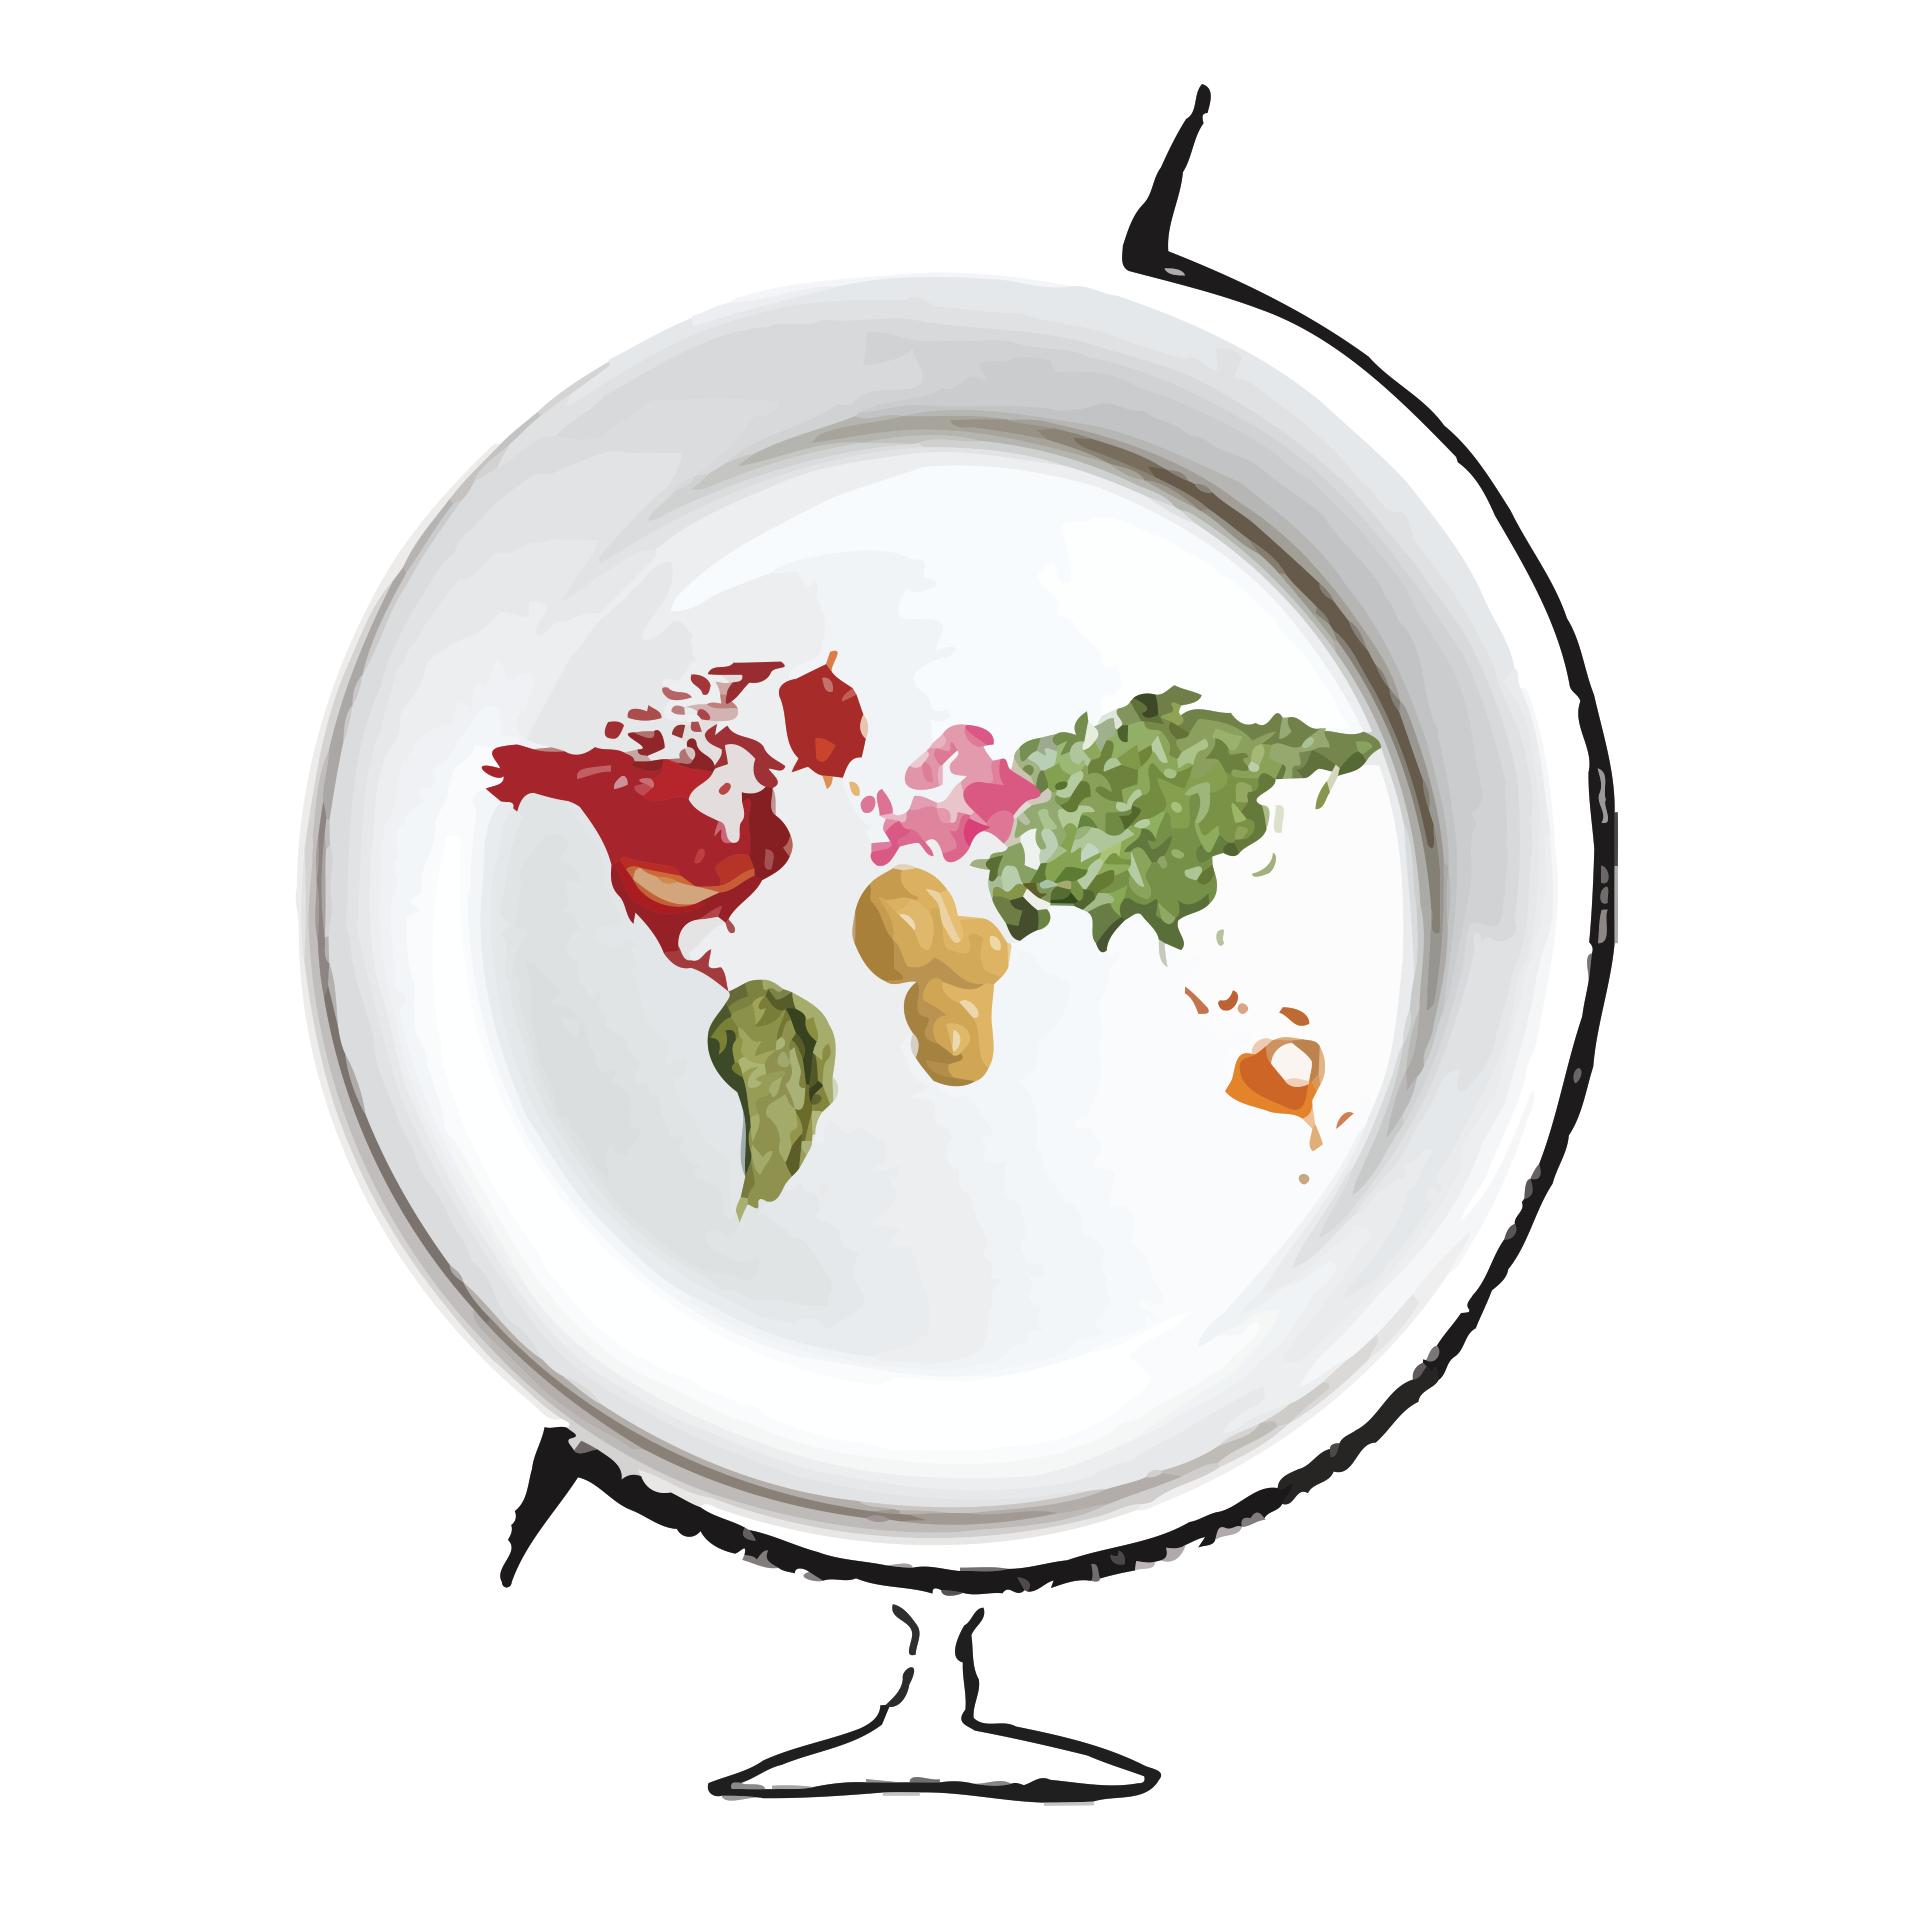 Programa de San Sebastián Gastronómika 2016